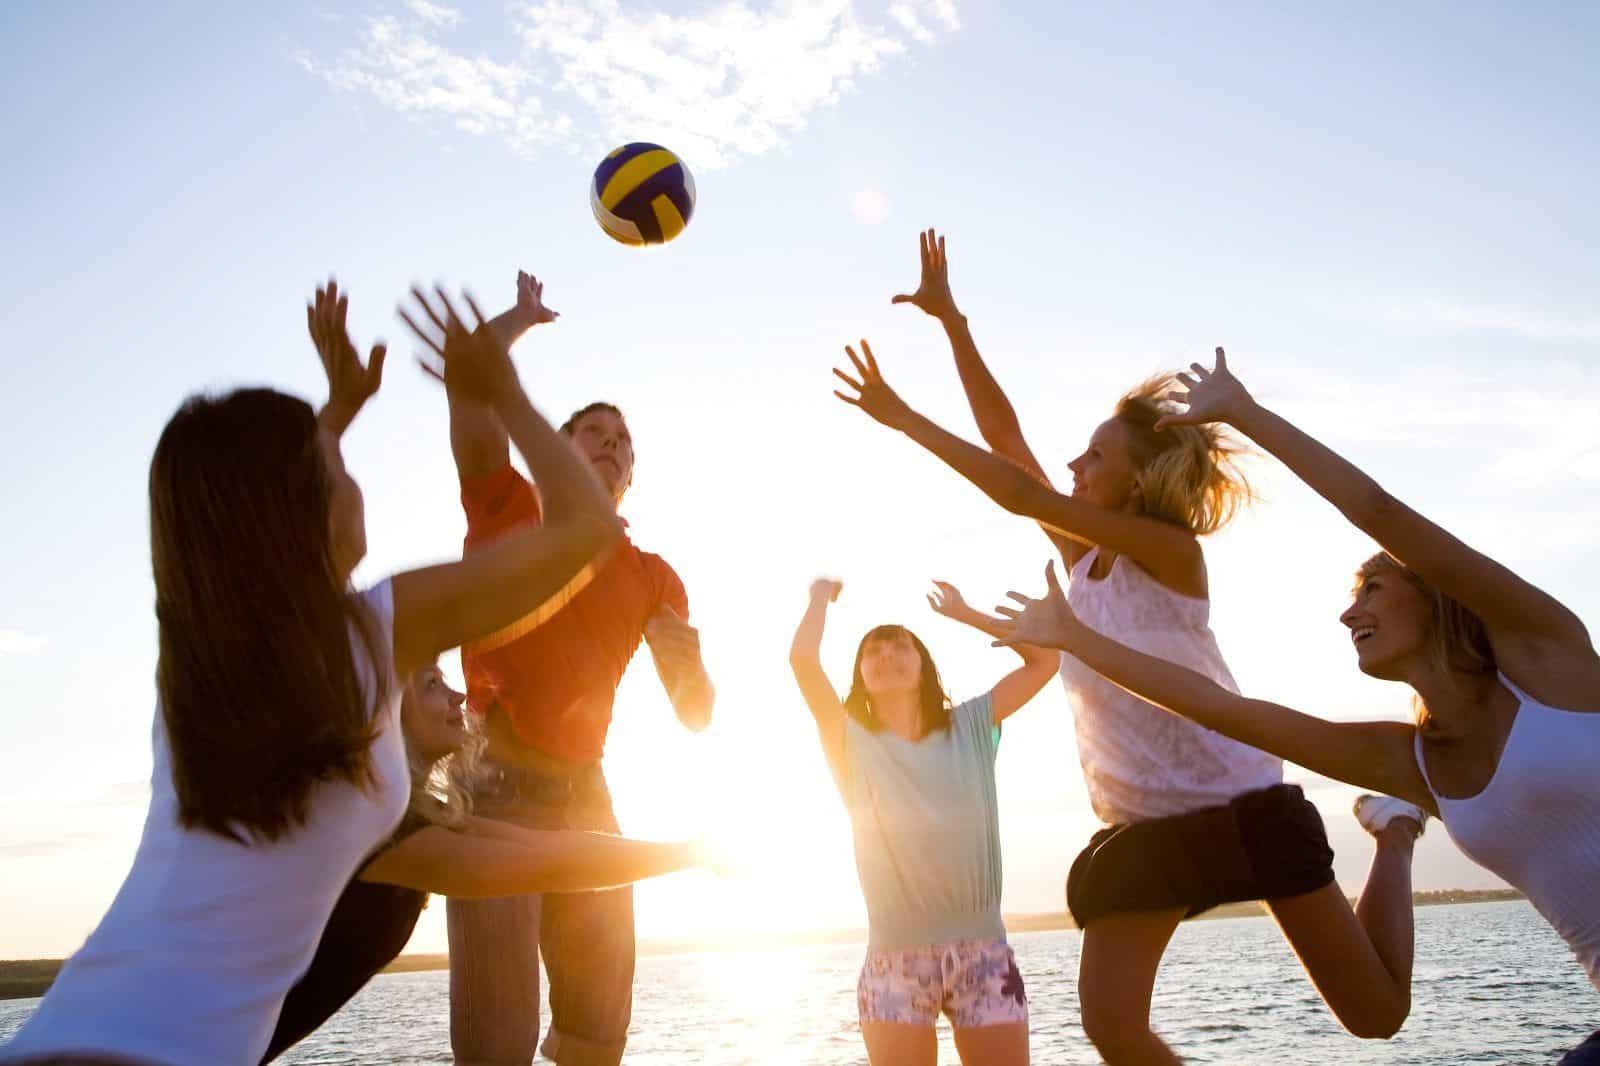 sommerfest-aktiv-sportlich-b-ceed-event